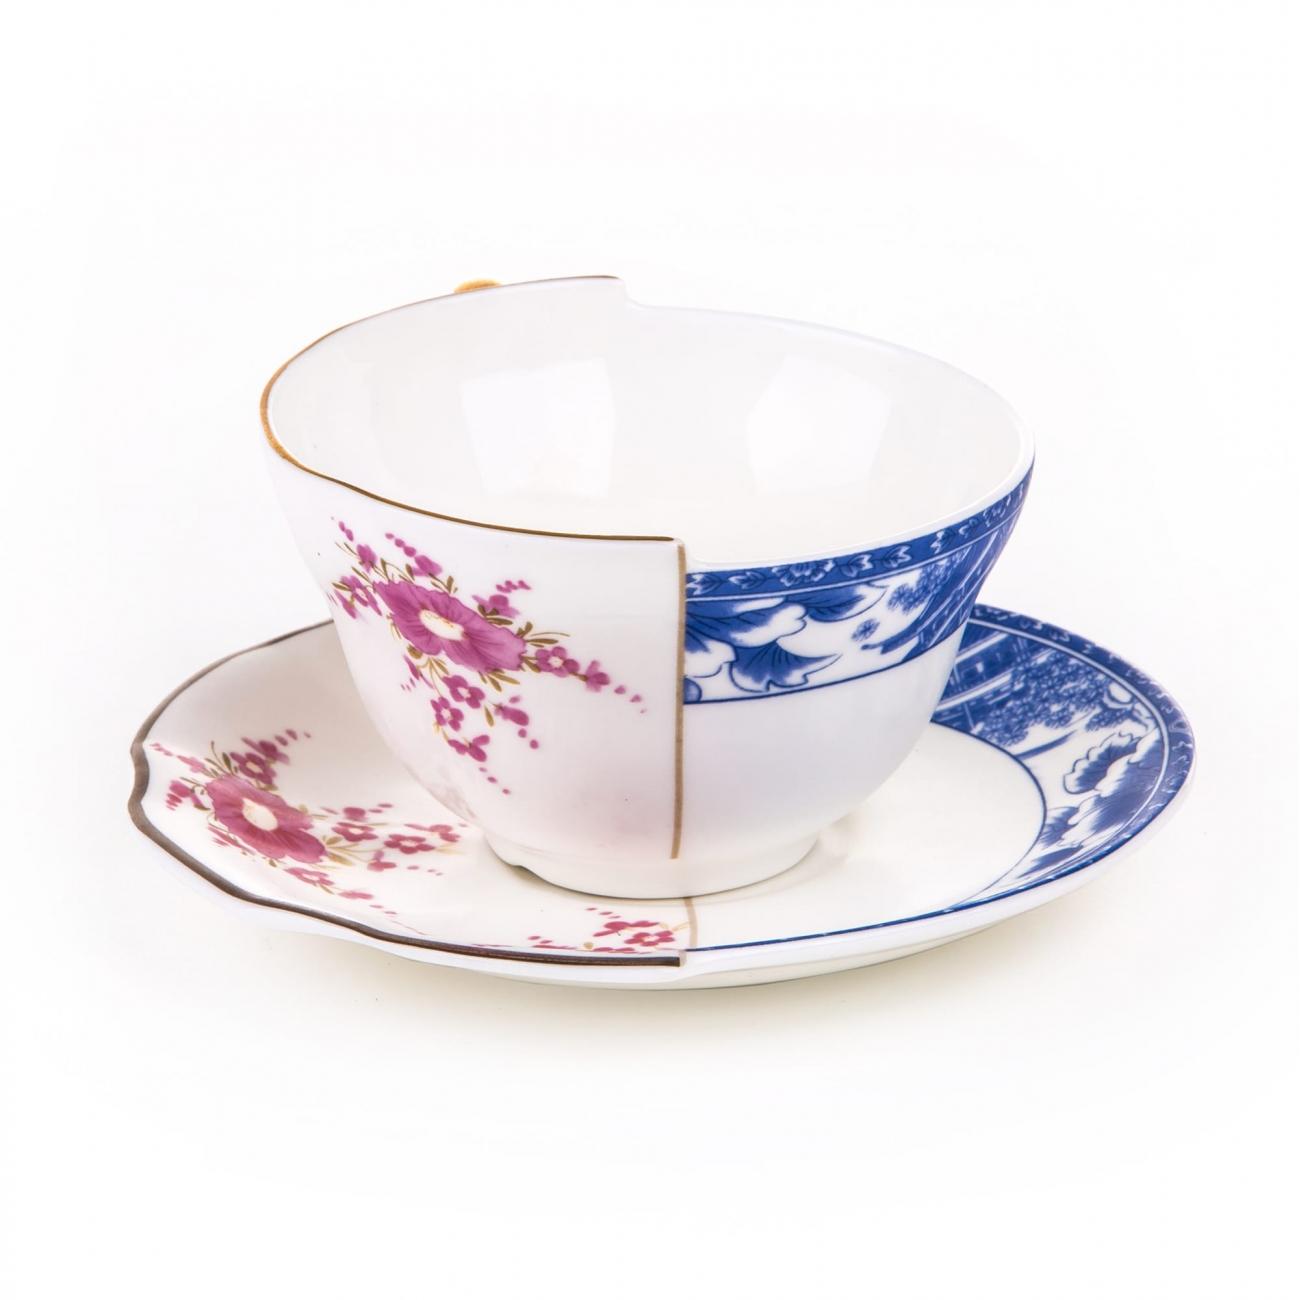 SELETTI HYBRID ZENOBIA TEA CUP